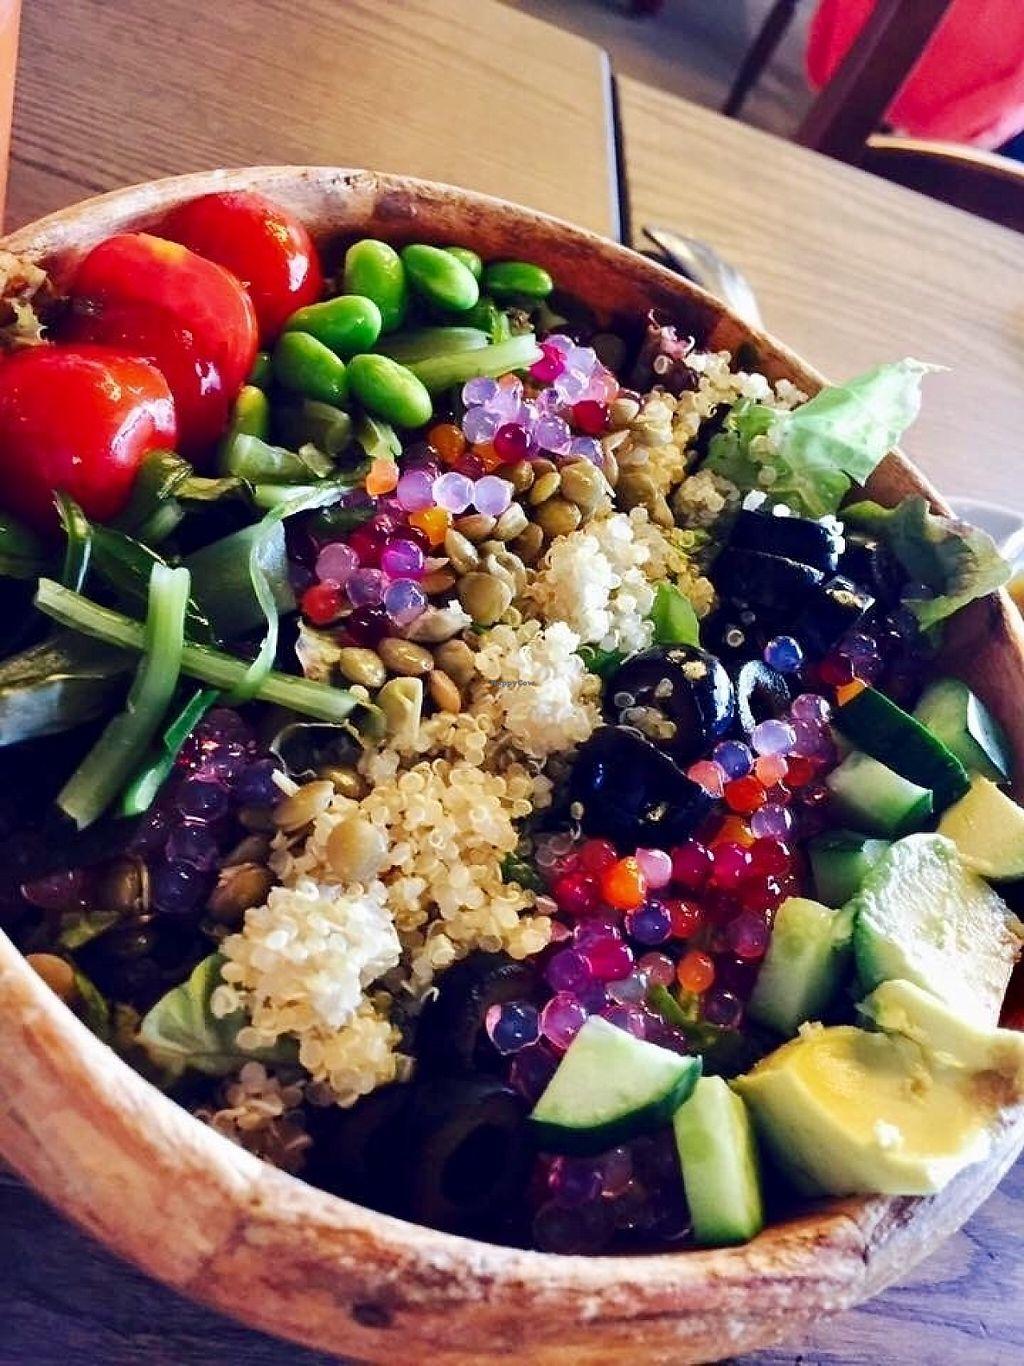 "Photo of Cafe La Boheme - Shirokane  by <a href=""/members/profile/paulkates"">paulkates</a> <br/>Vegan tofu salad <br/> June 7, 2017  - <a href='/contact/abuse/image/93489/266546'>Report</a>"